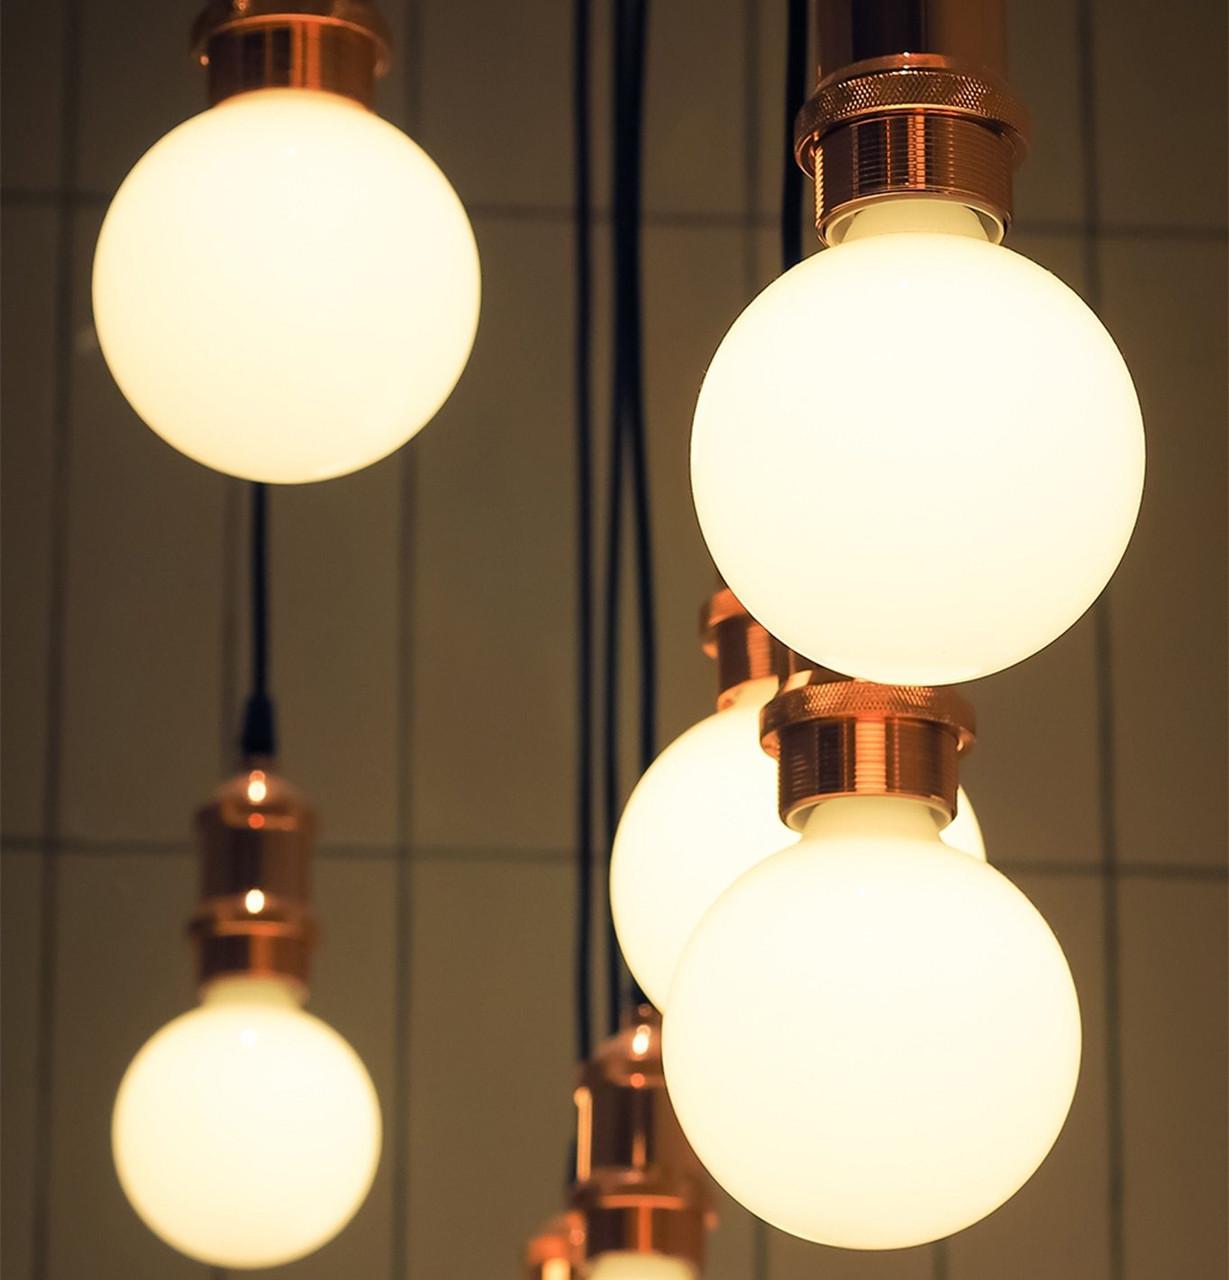 LED Globe BC-B22d Light Bulbs